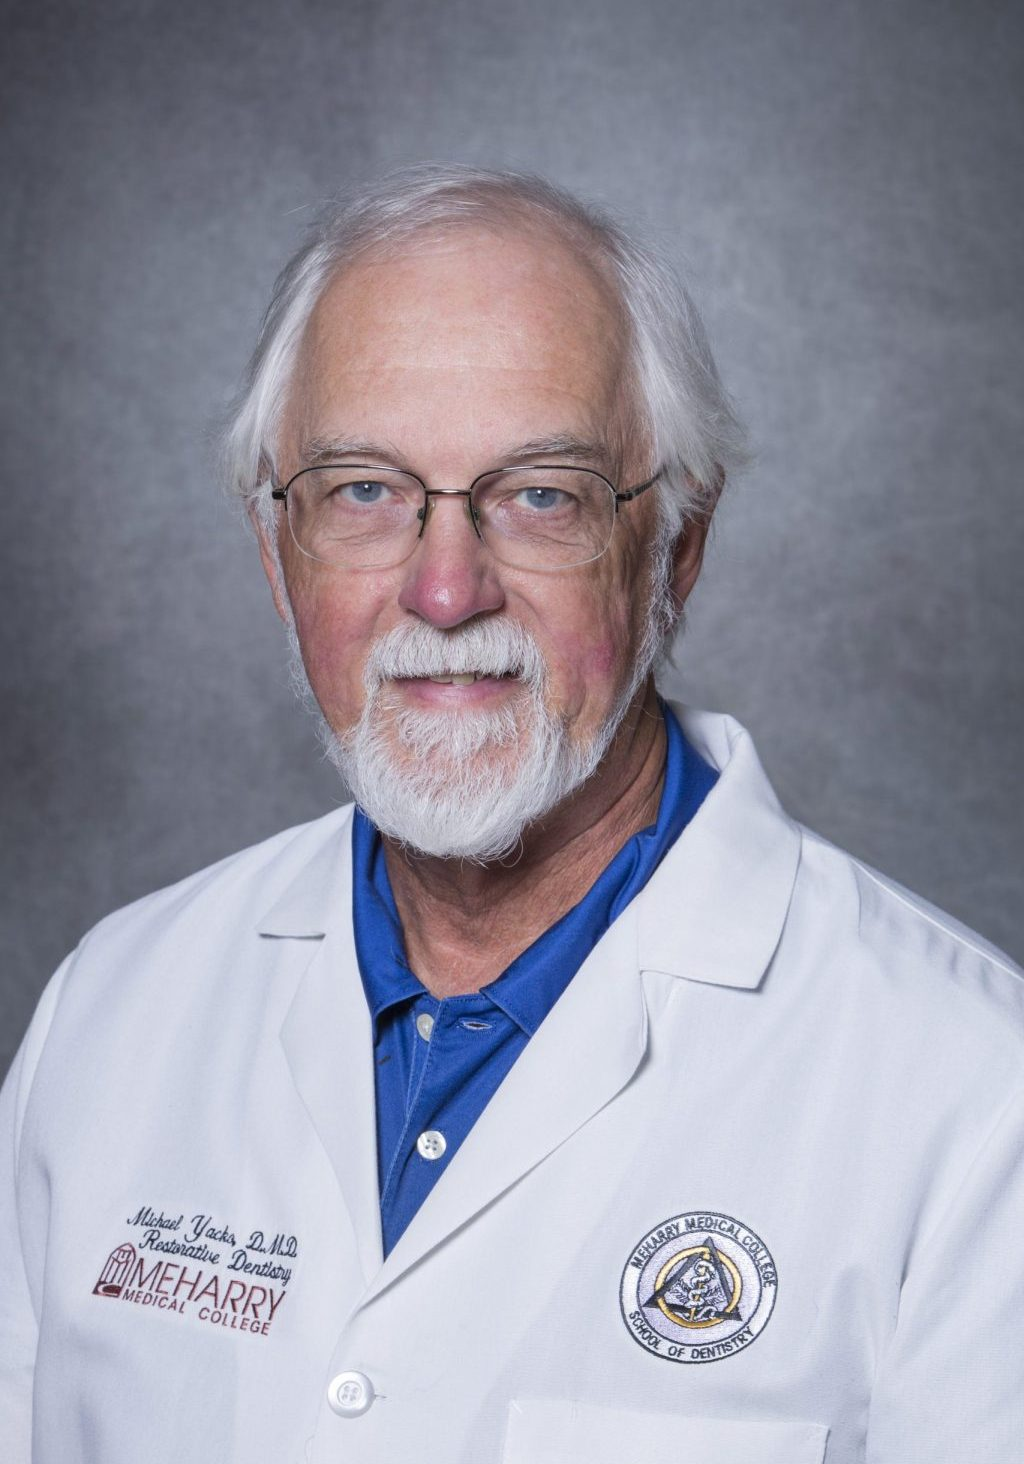 Dr. Michael Yacko_0842